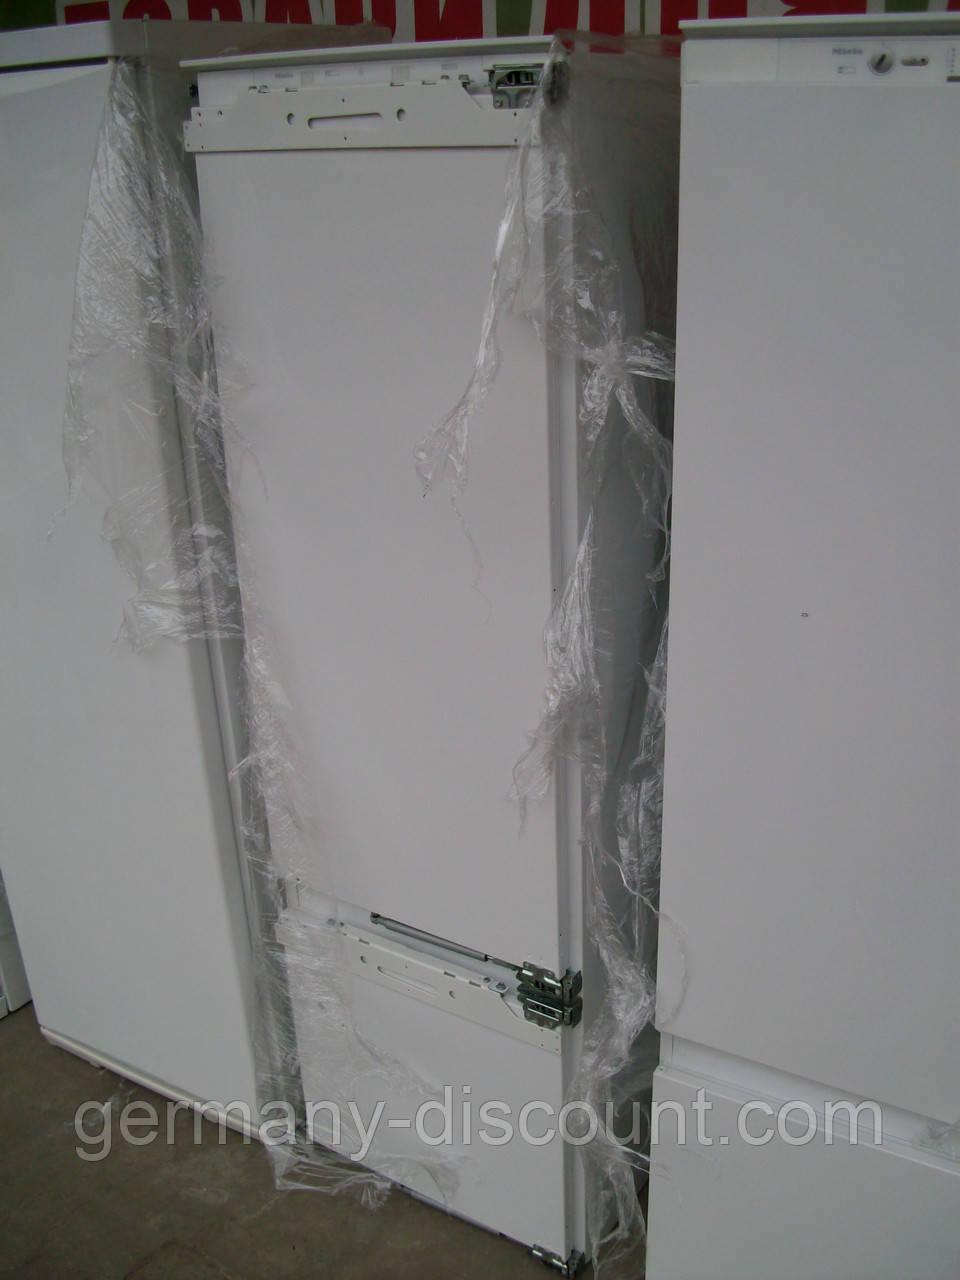 Холодильник встраеваемый Miele KFN 9757 iD